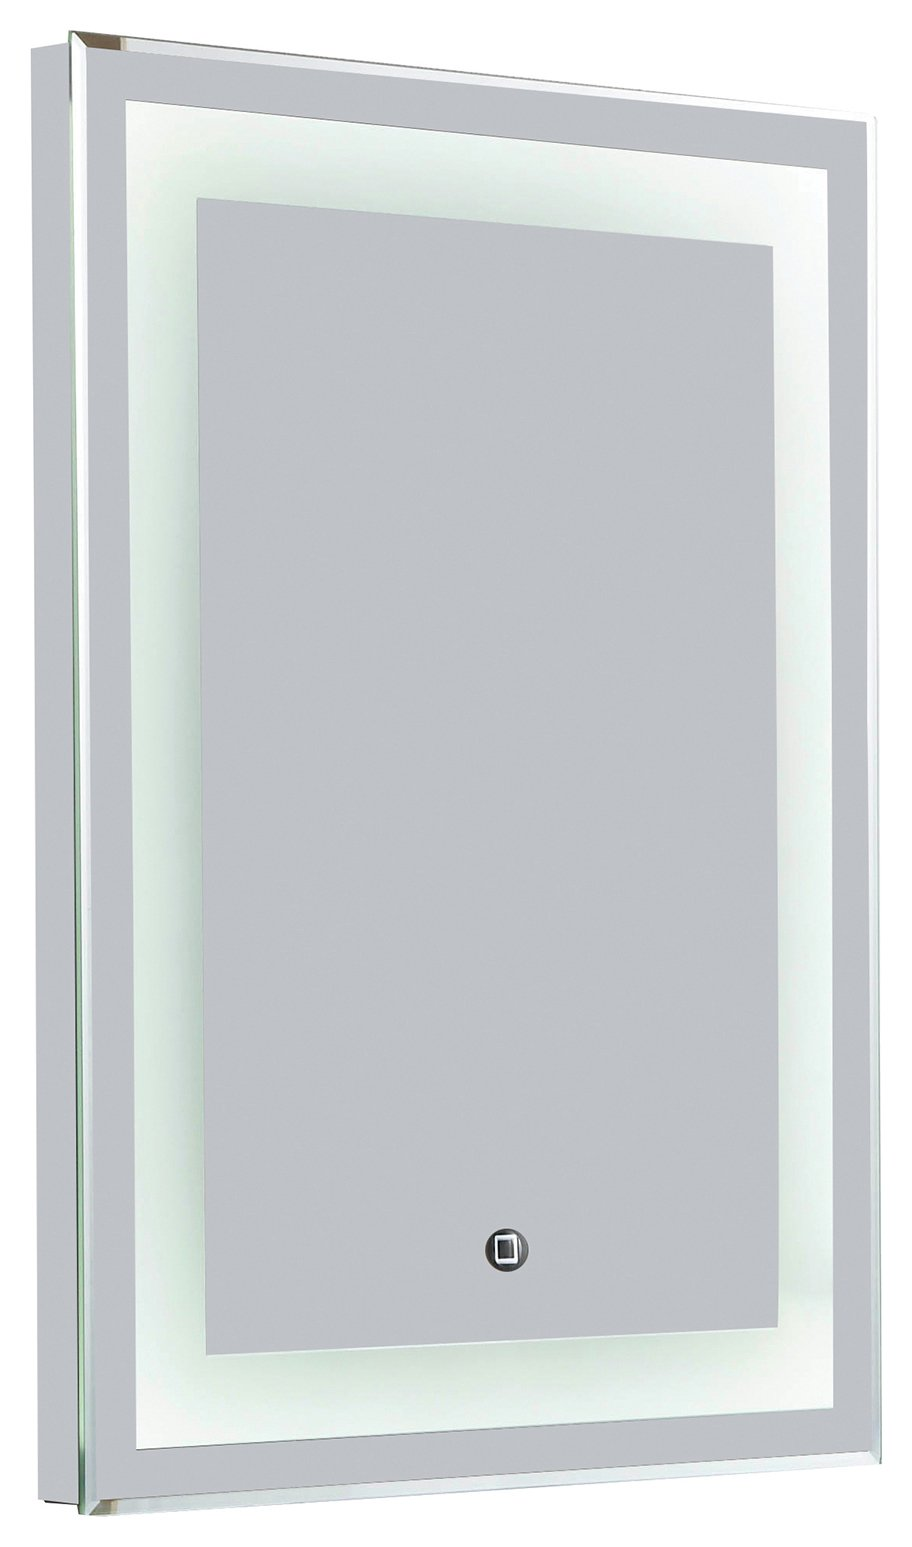 Croydex Rookley Hang N Lock LED Illuminated Mirror